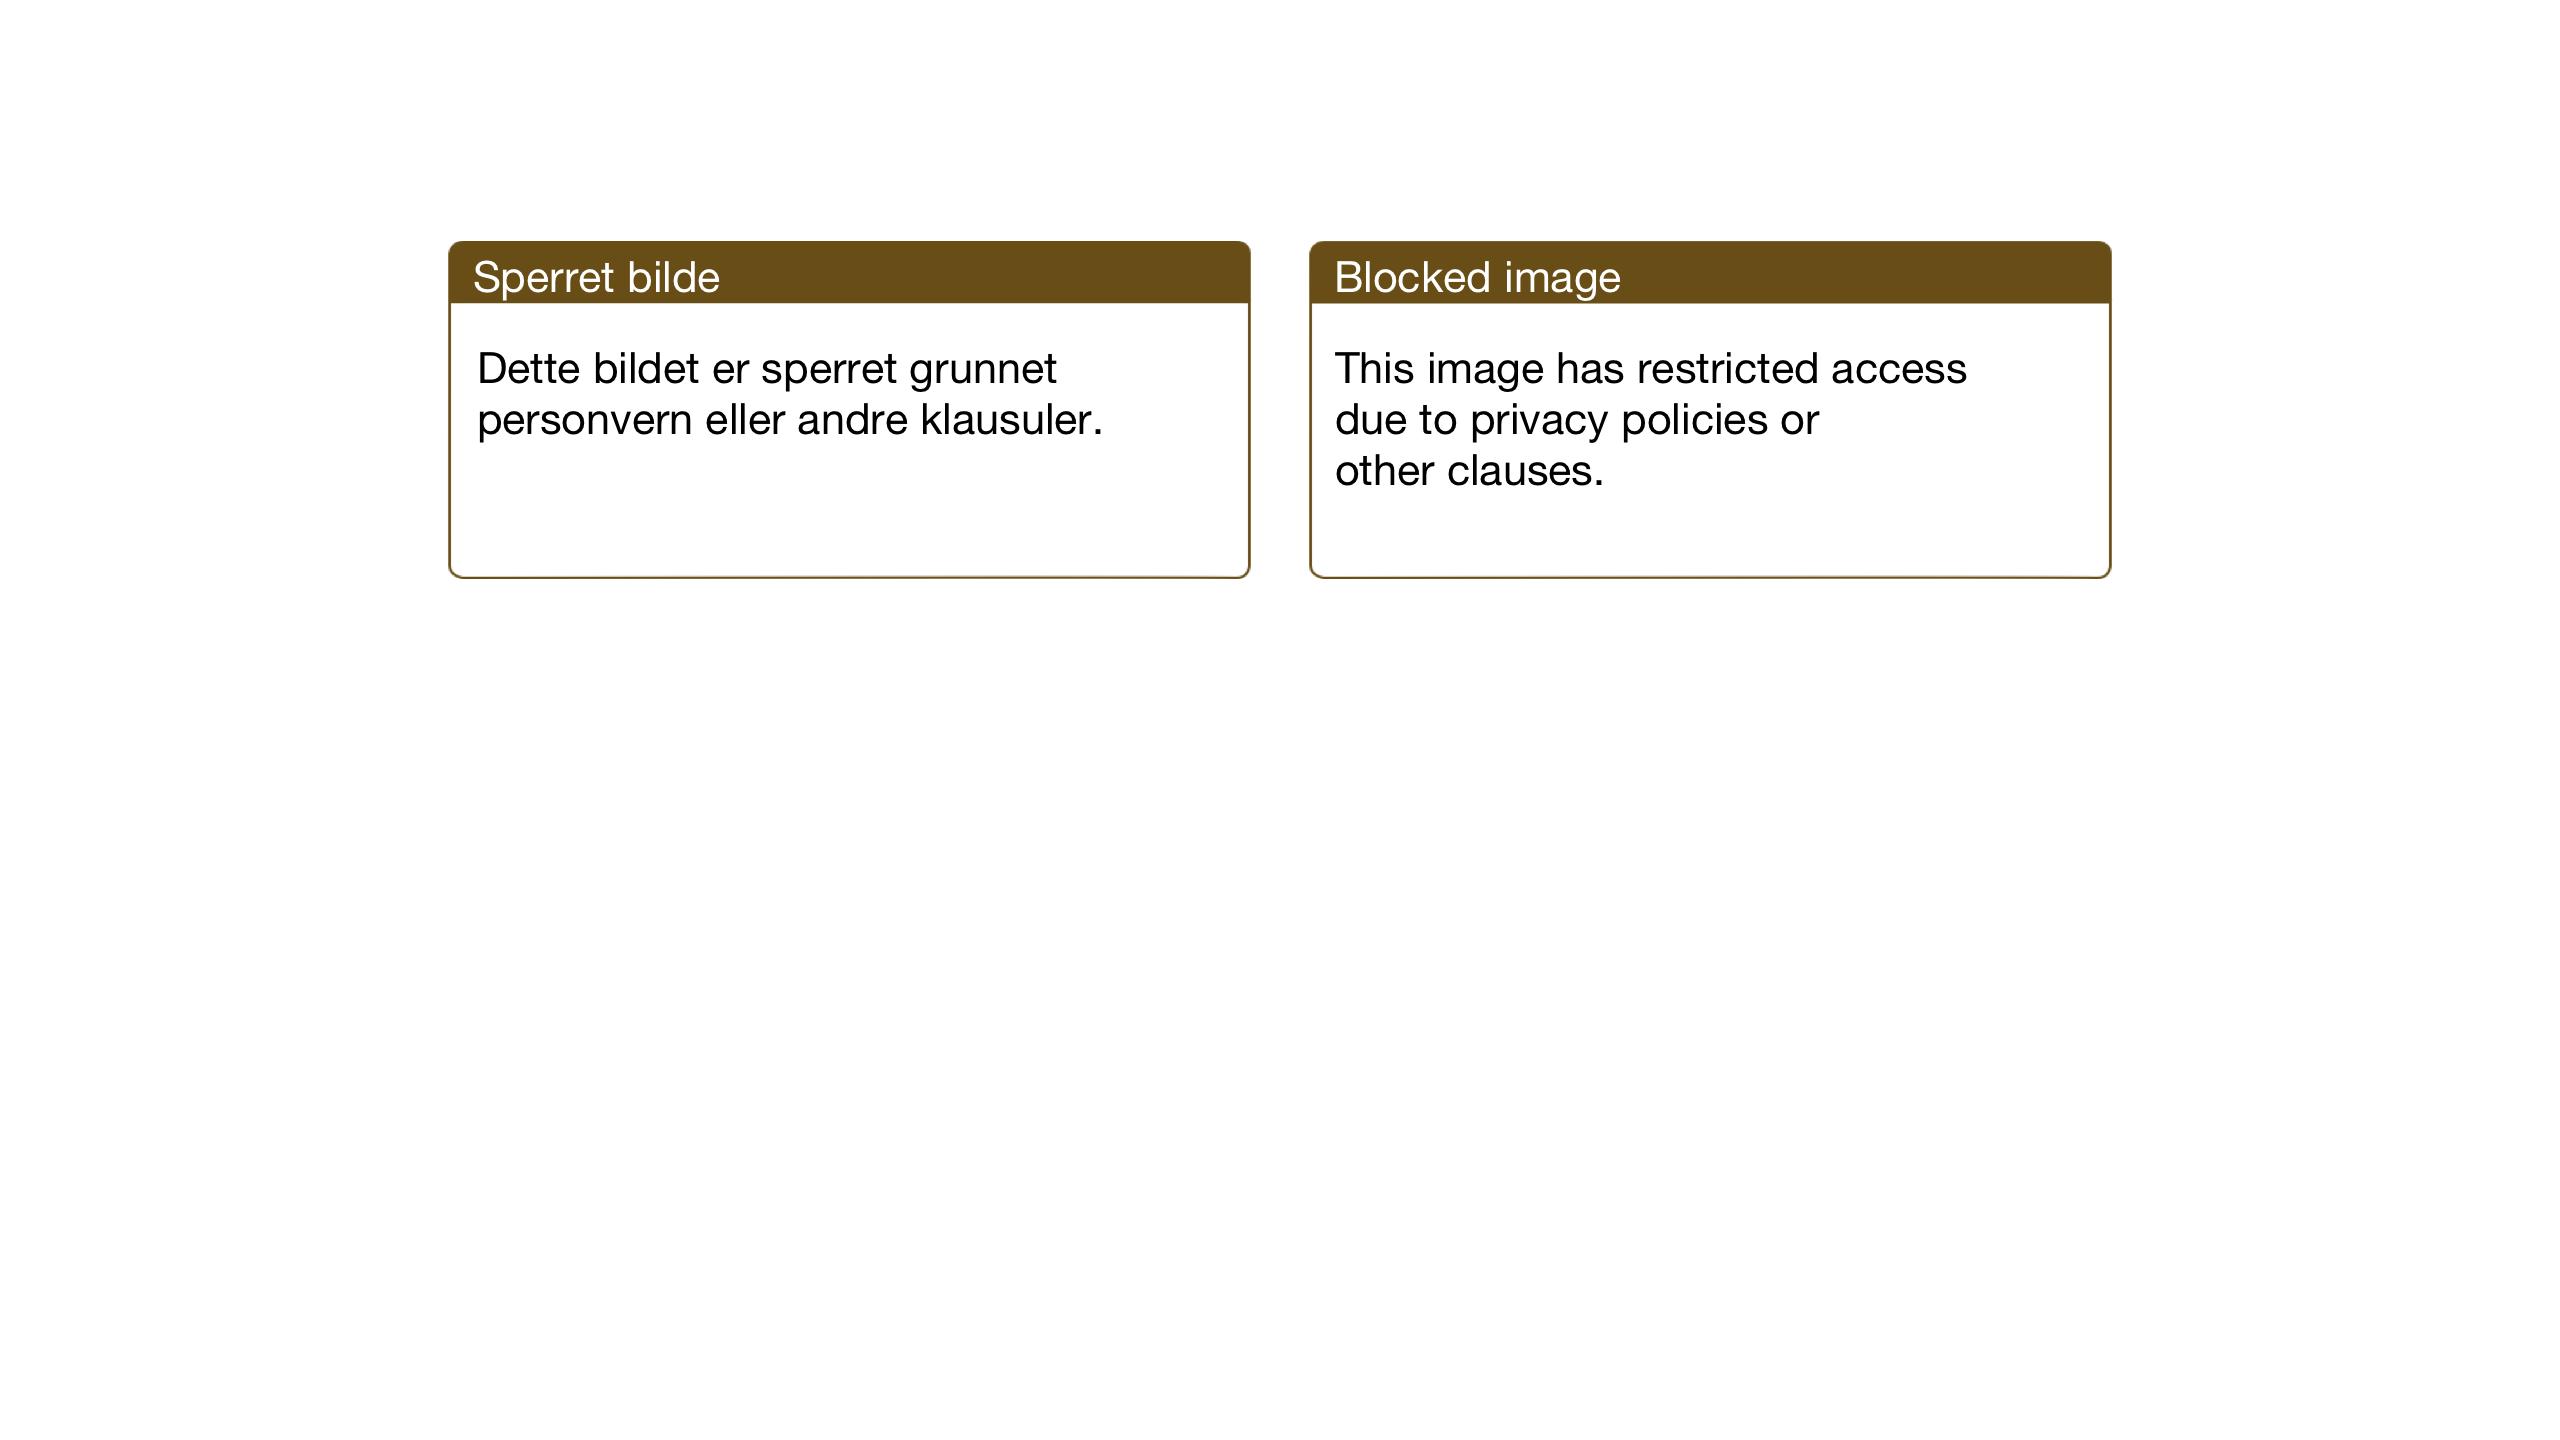 SAT, Ministerialprotokoller, klokkerbøker og fødselsregistre - Sør-Trøndelag, 686/L0986: Parish register (copy) no. 686C02, 1933-1950, p. 7